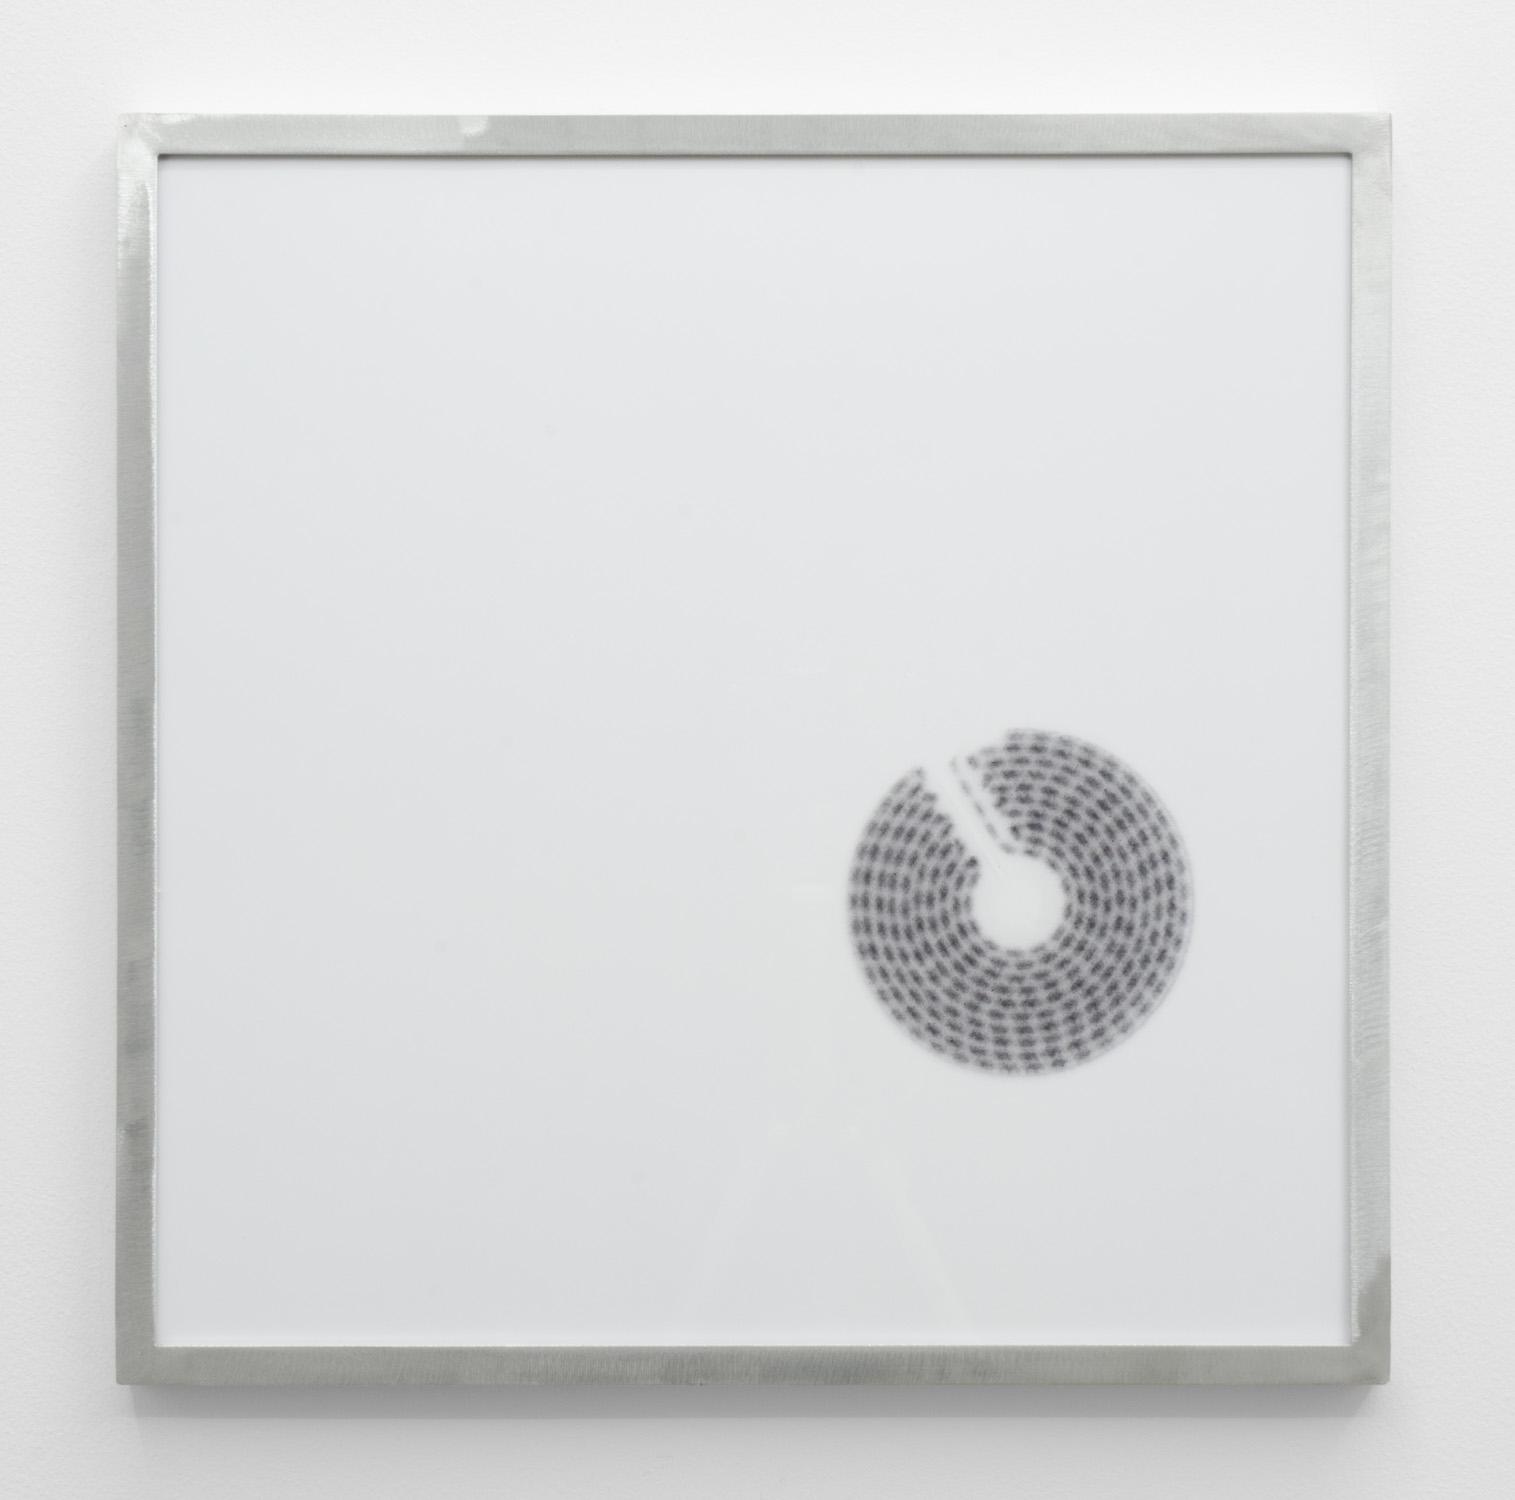 IR-1 , 2014, giclee print on hahnemuhle photorag, custom aluminium frame 40 x 40 cm.